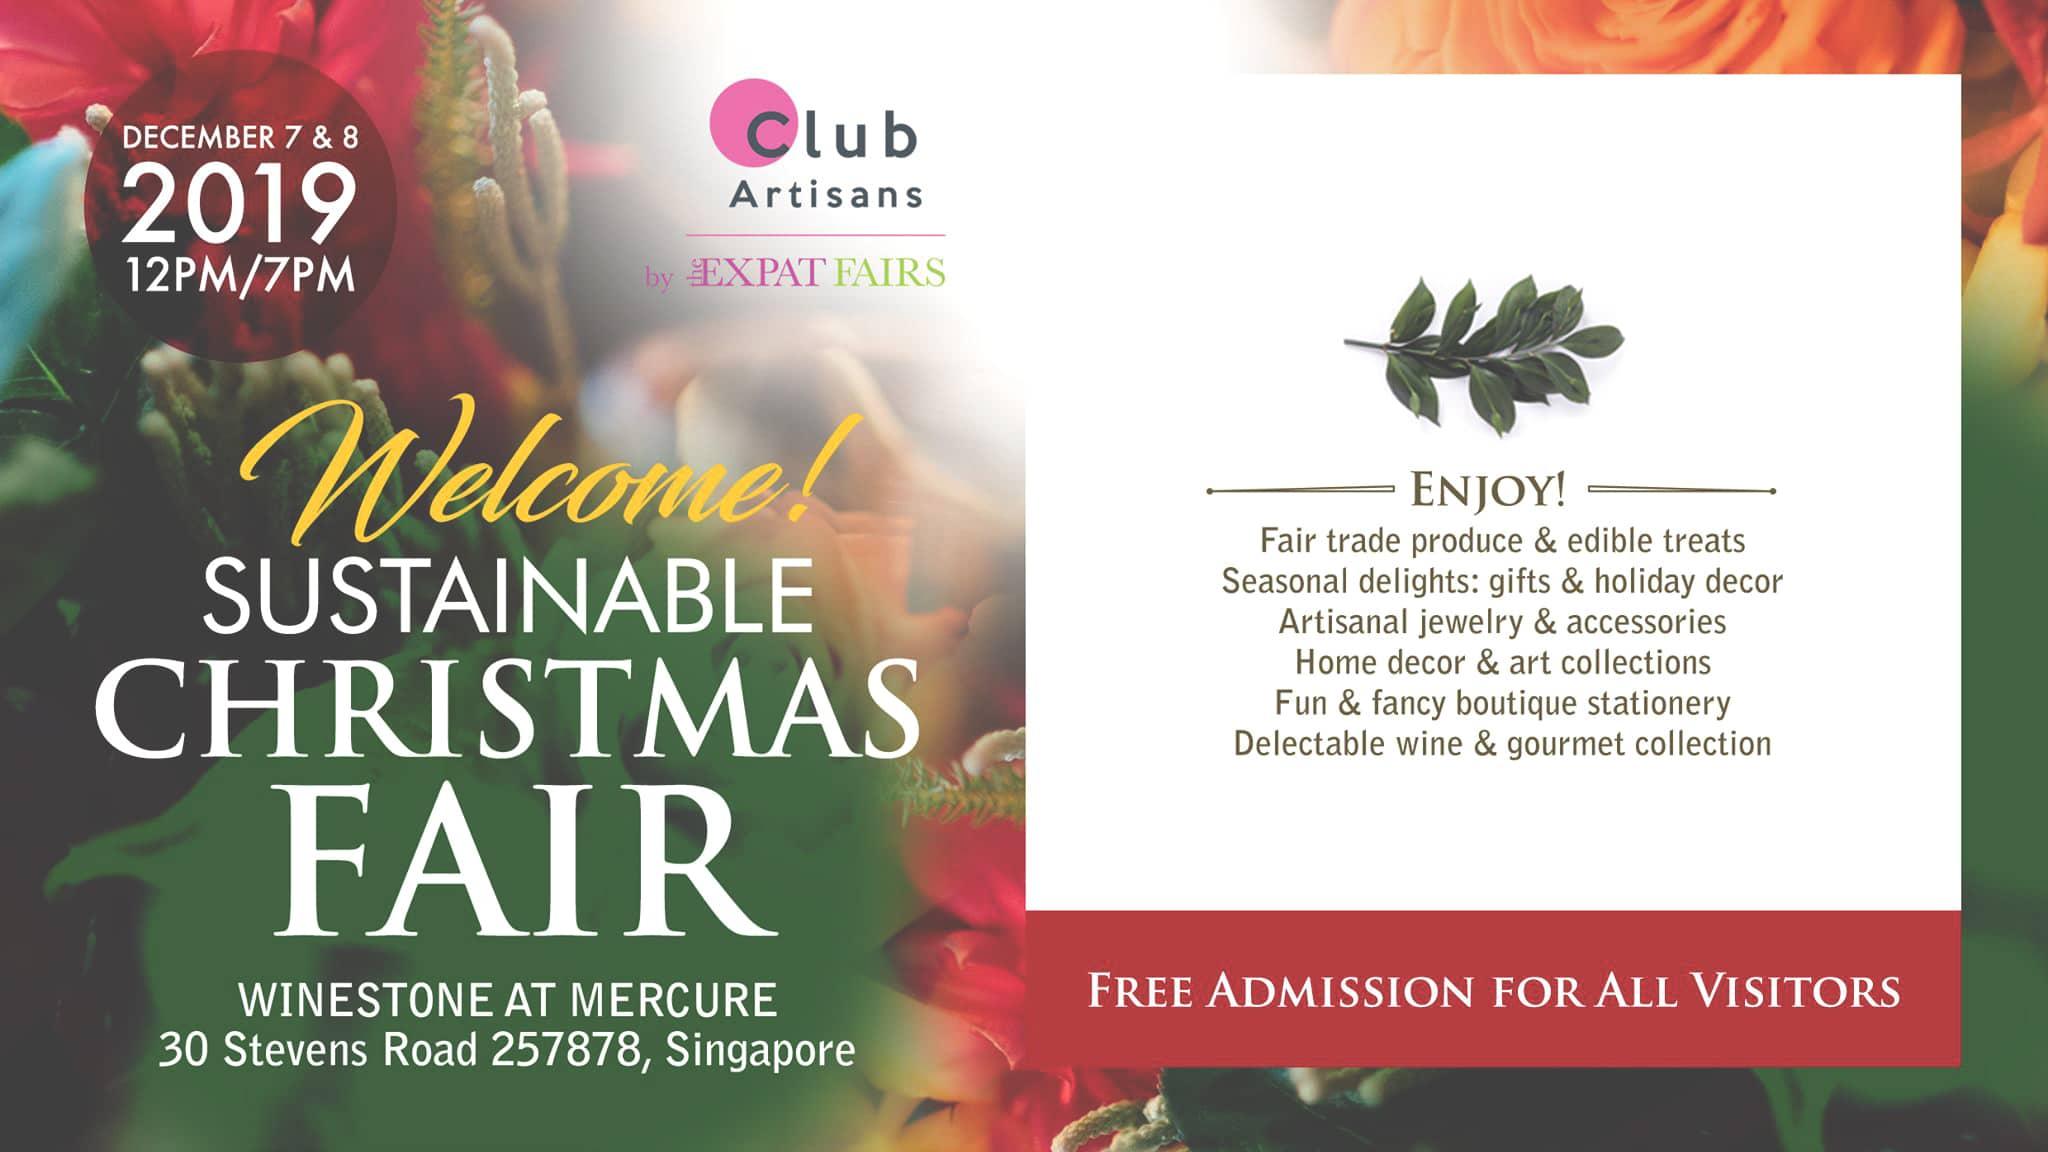 Christmas fair in Singapore